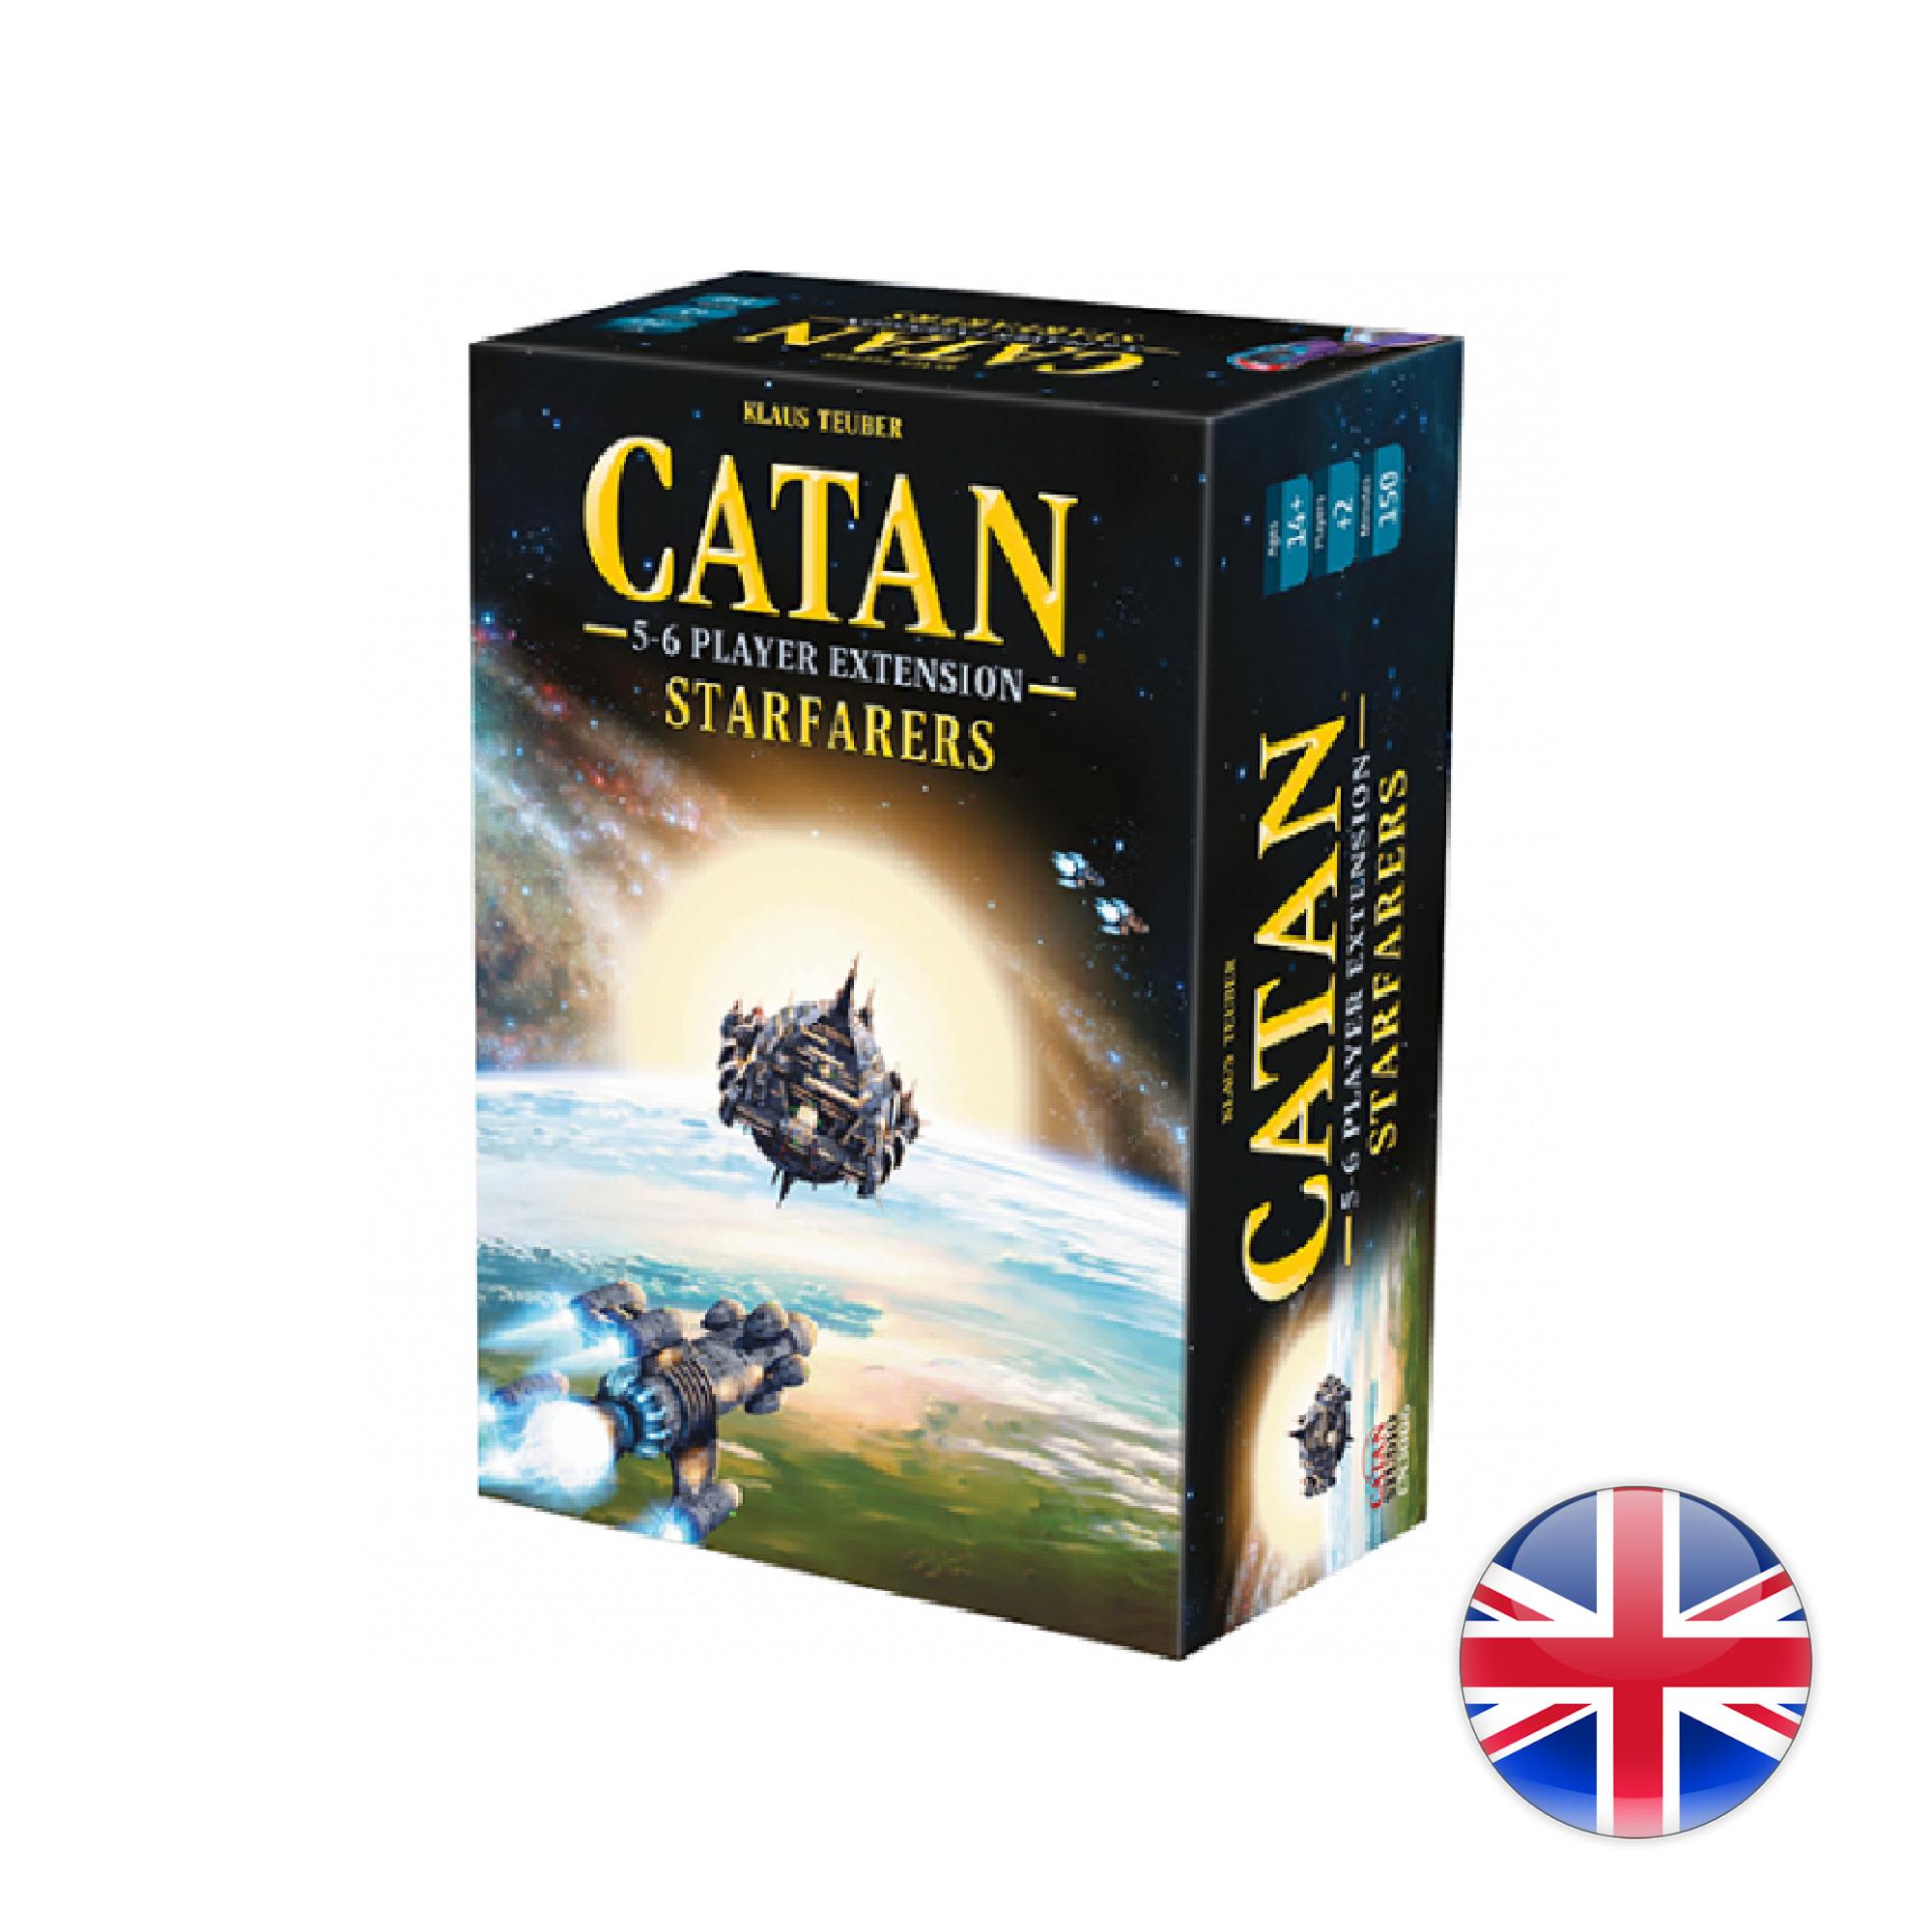 Catan - Starfarers - 5-6 players